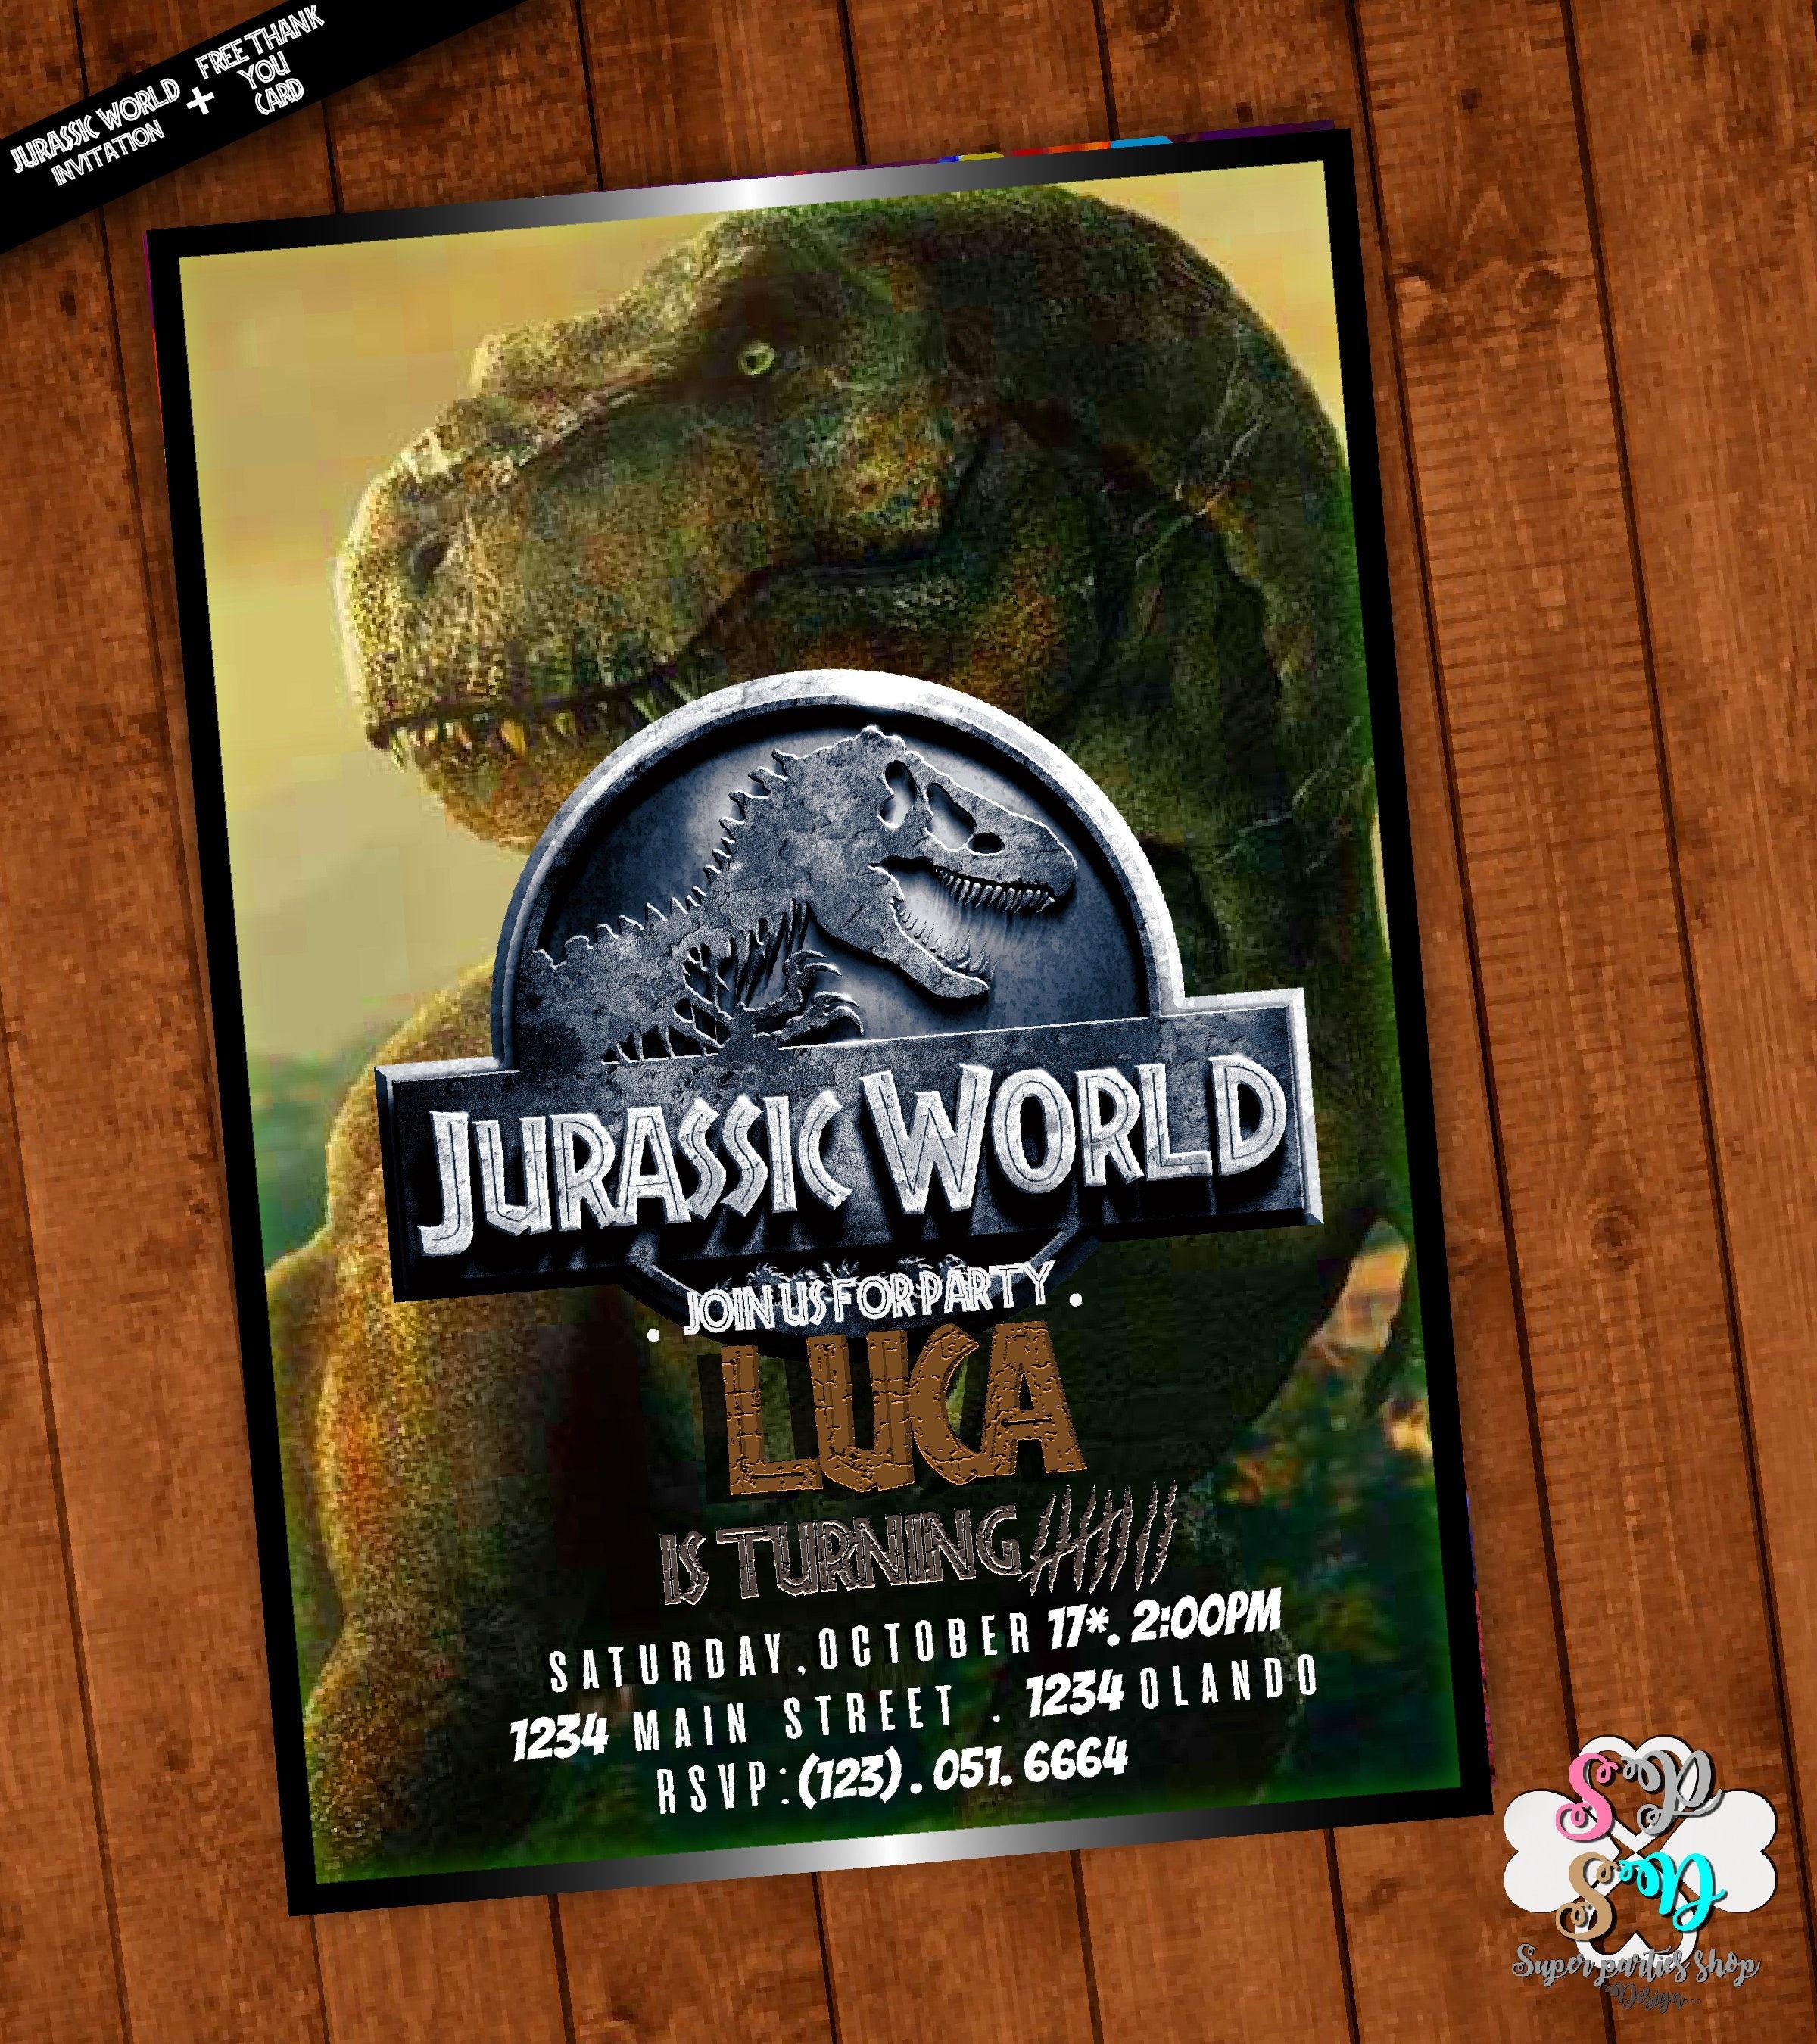 Jurassic World Invitation Printable With Free Thank You Card   Etsy - Free Printable Jurassic Park Invitations